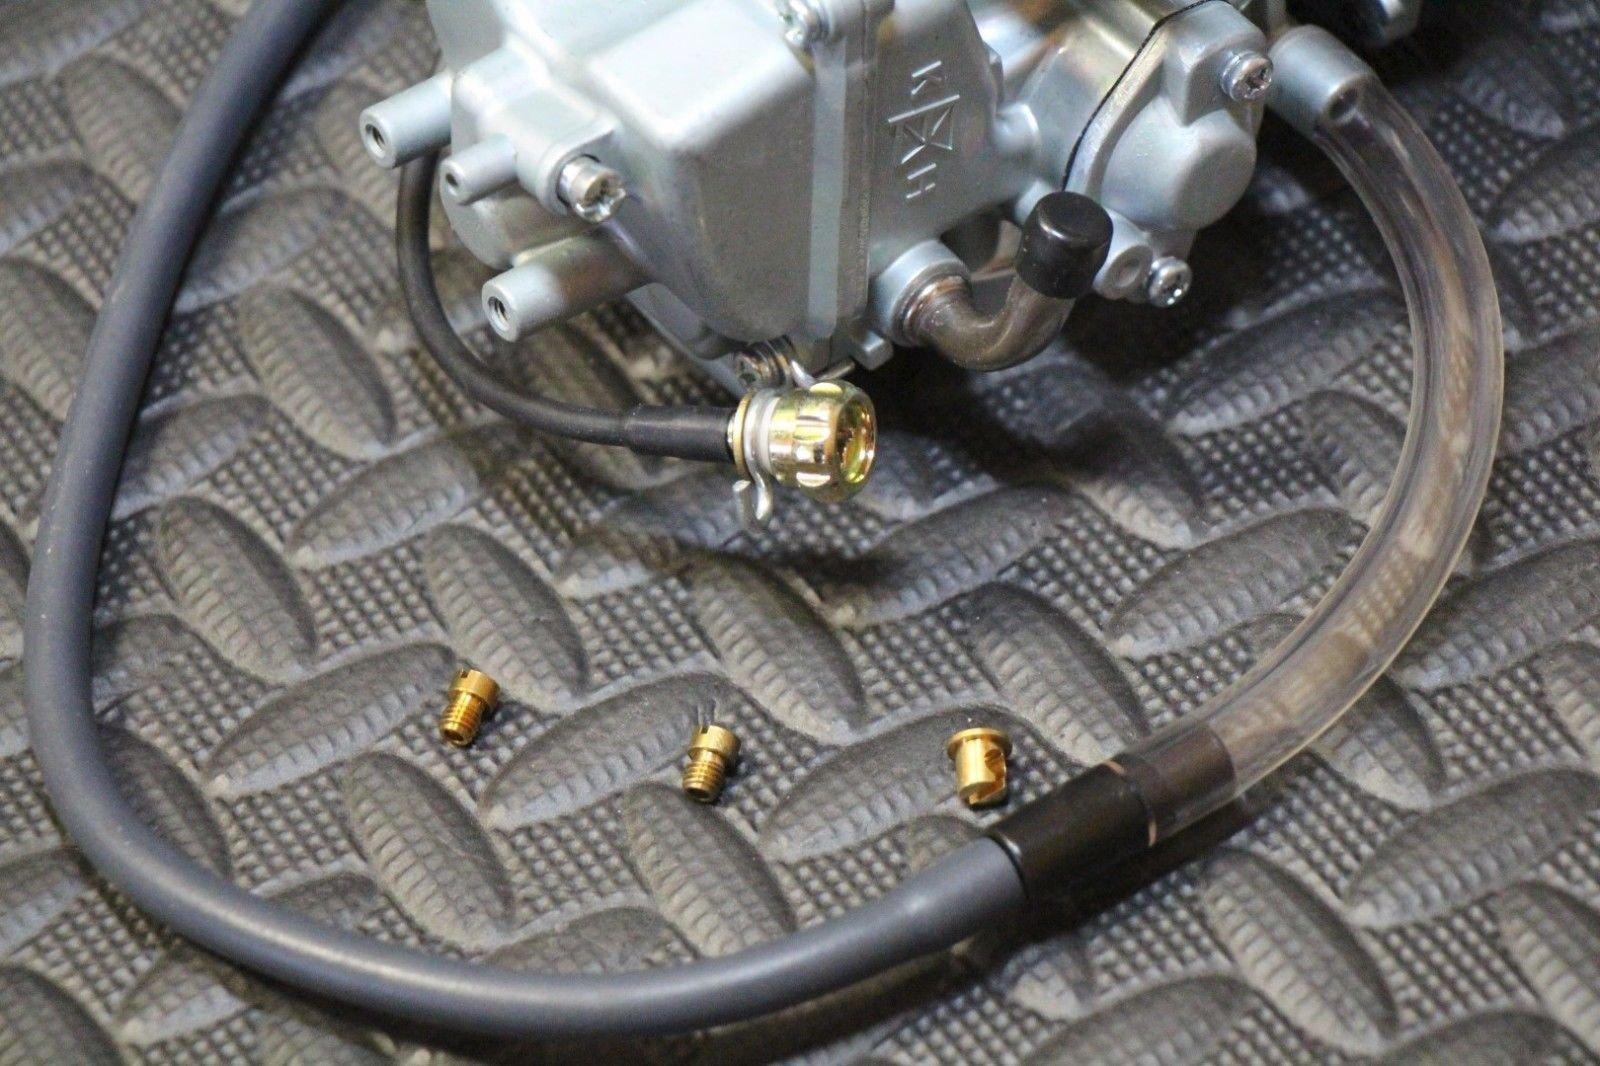 NEW Raptor 350 2004-2013 carburetor carb ATV ship from Michigan KFX400 2003-2007 by vitos performance (Image #6)